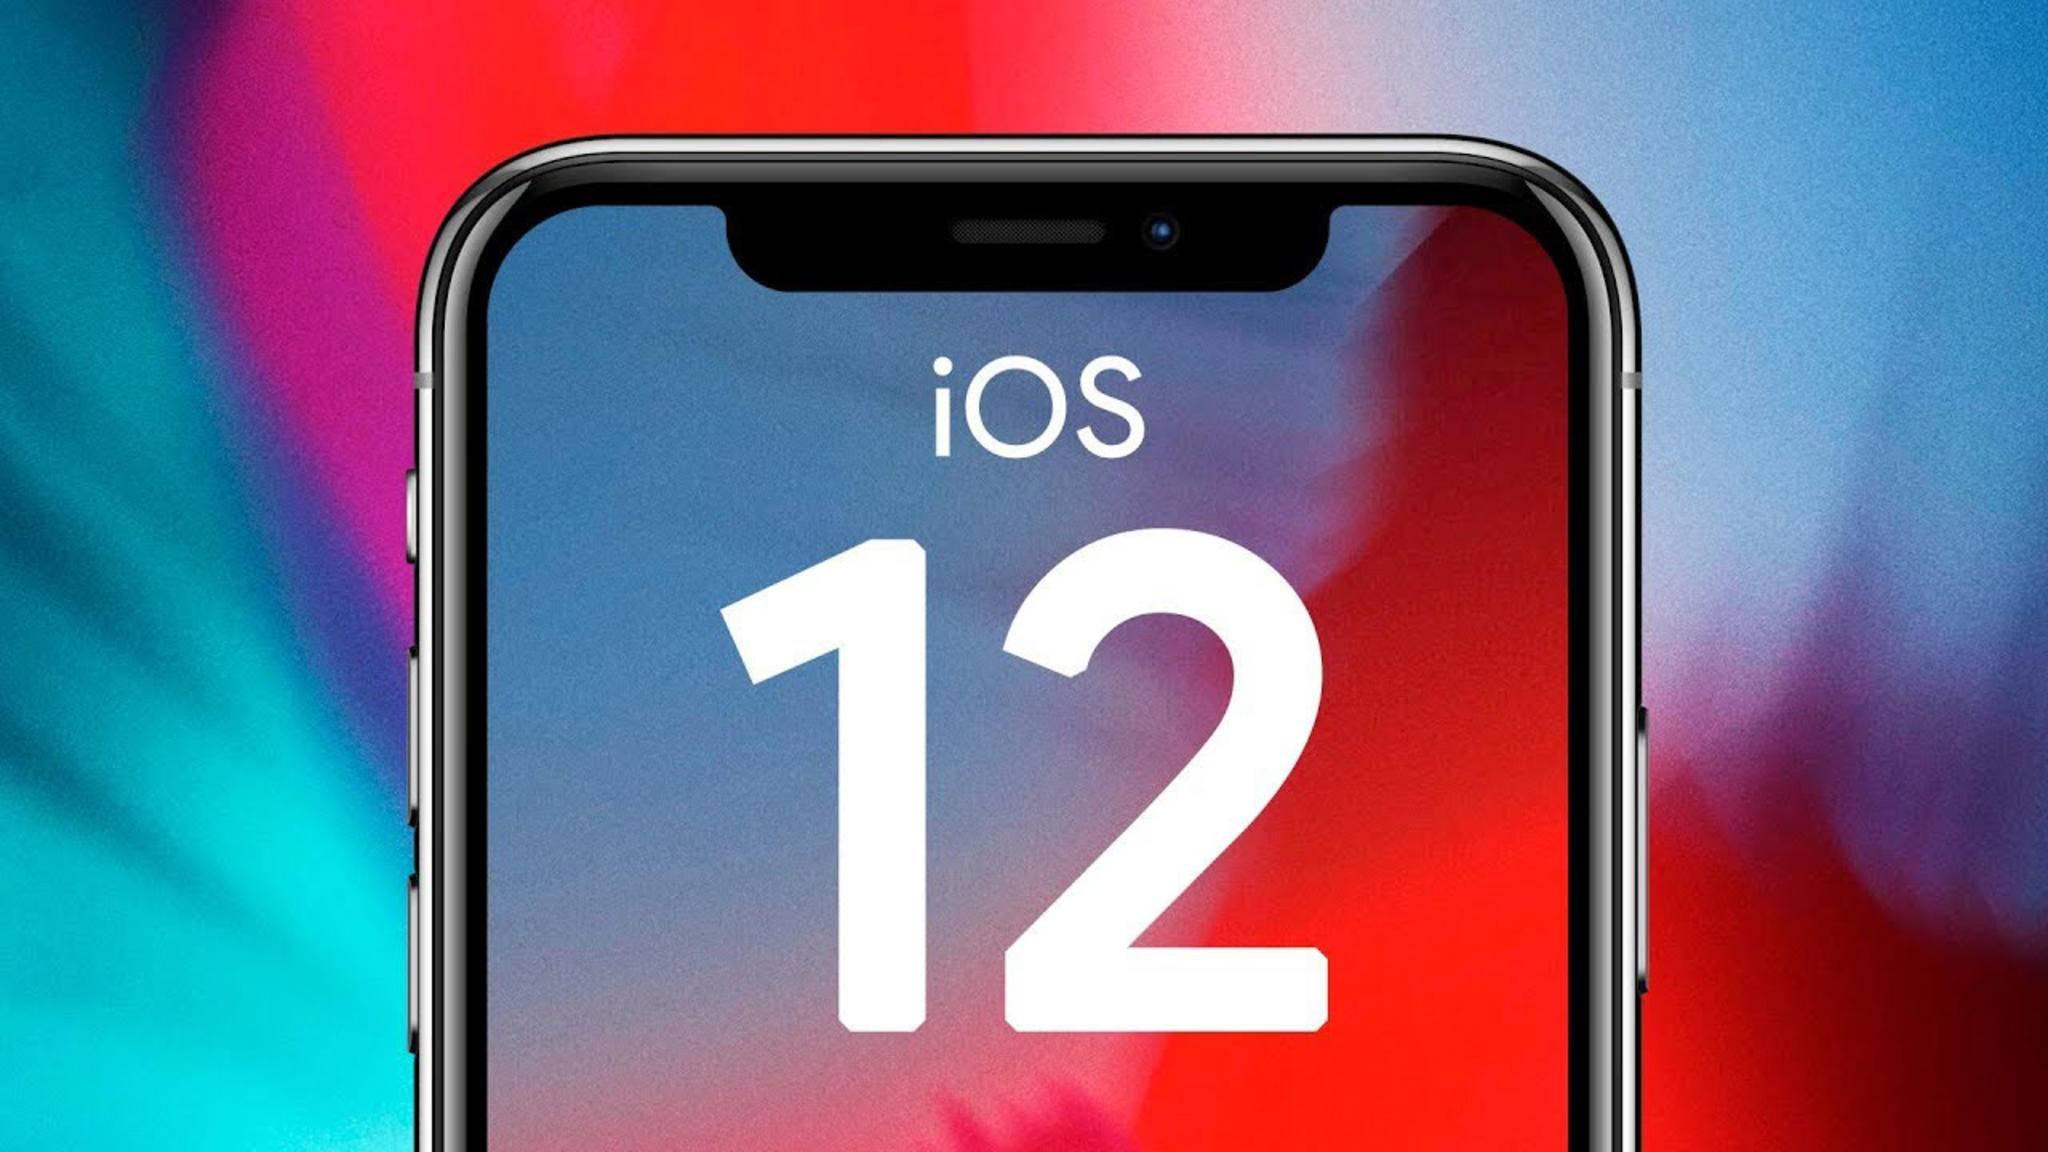 iOS 12 erschien im September 2018.